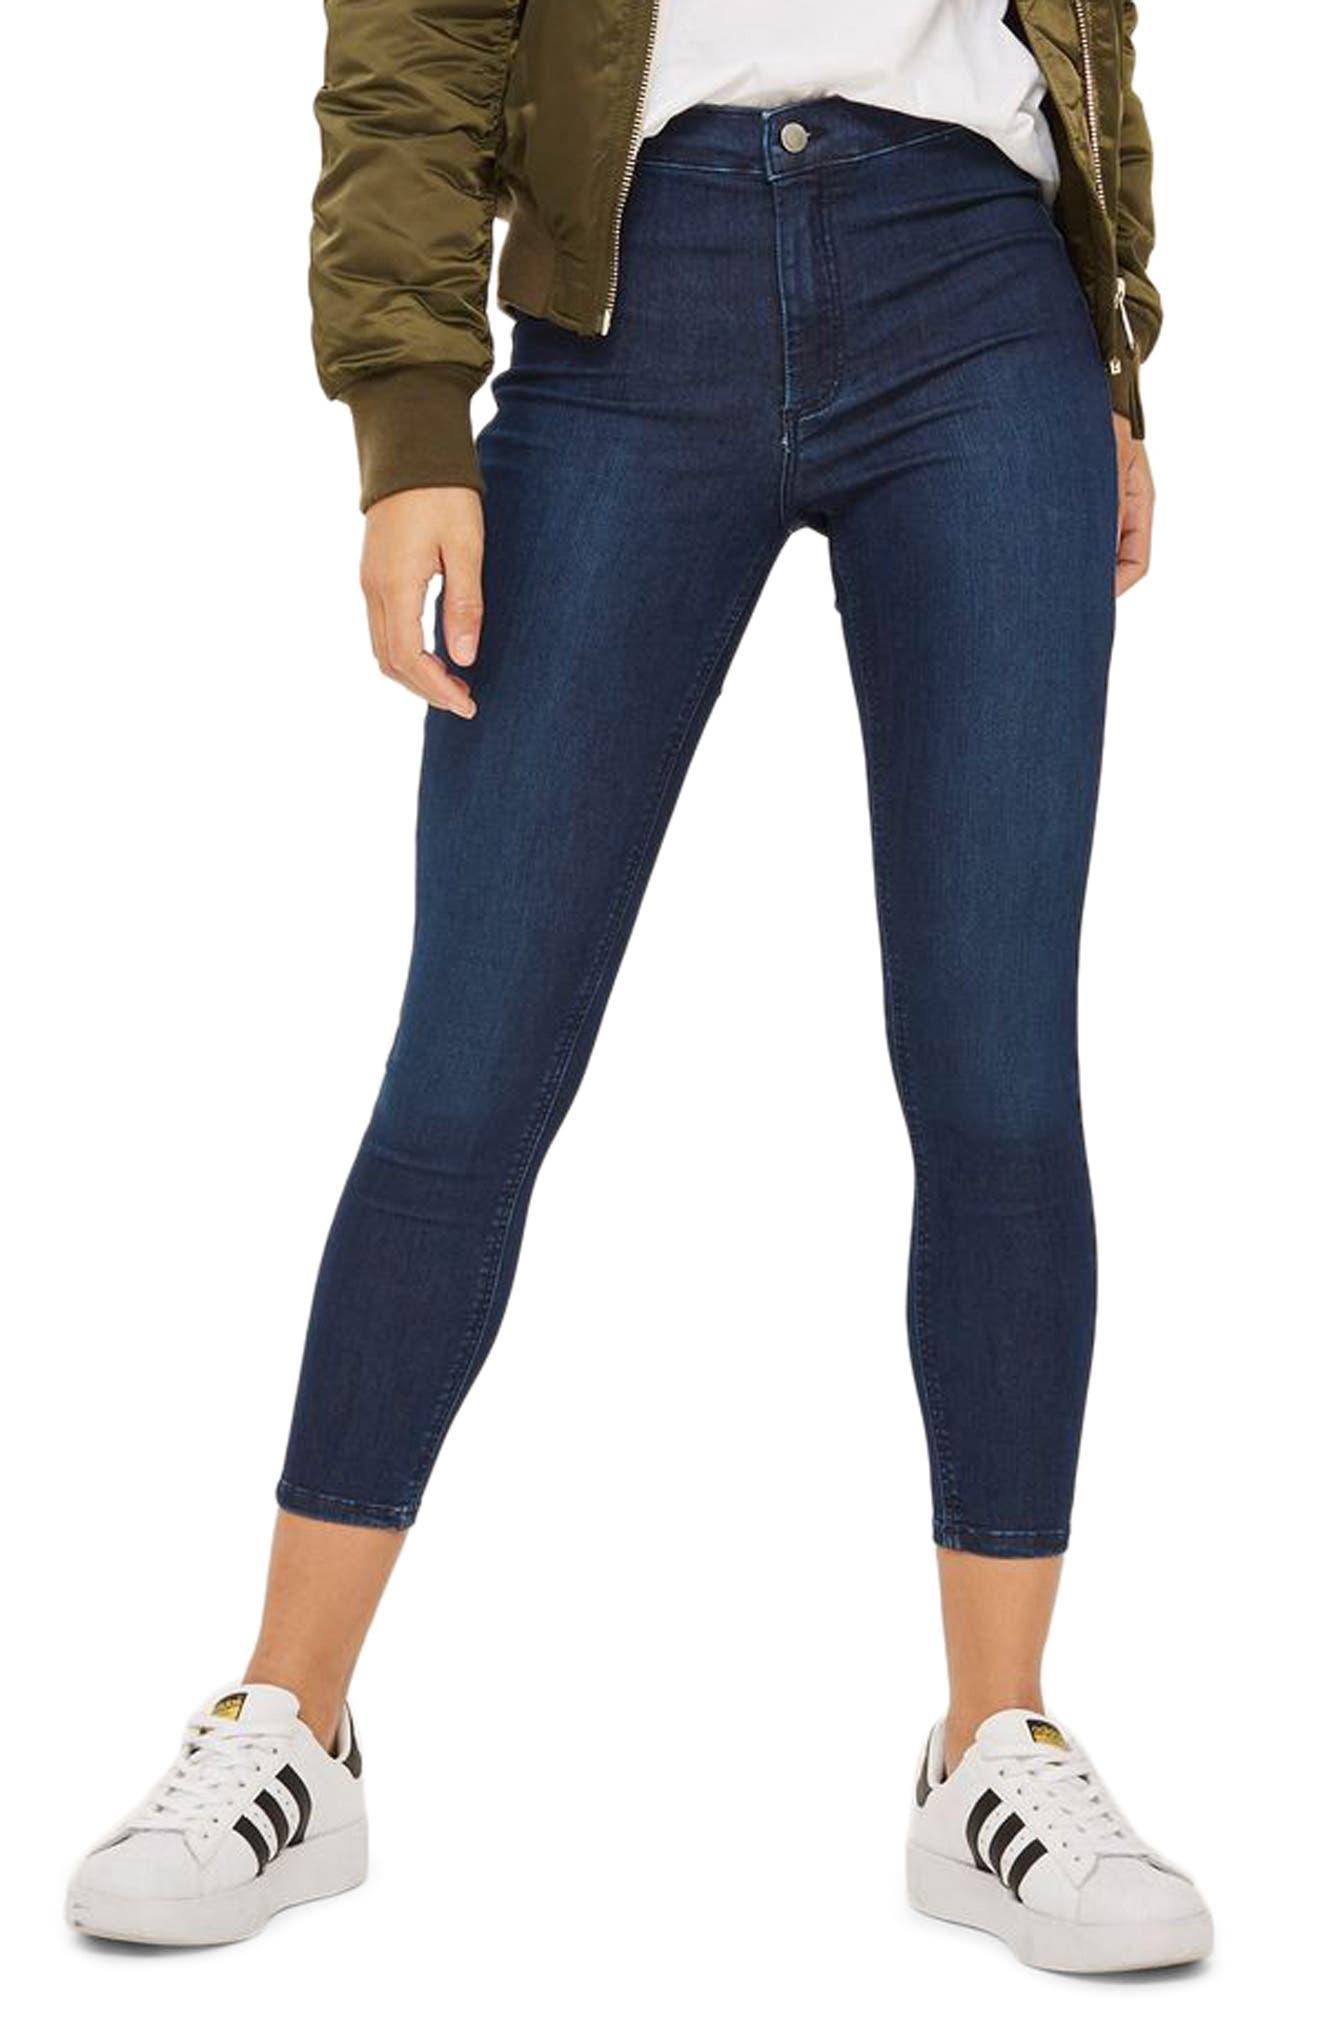 Joni High Waist Skinny Jeans,                         Main,                         color, Indigo